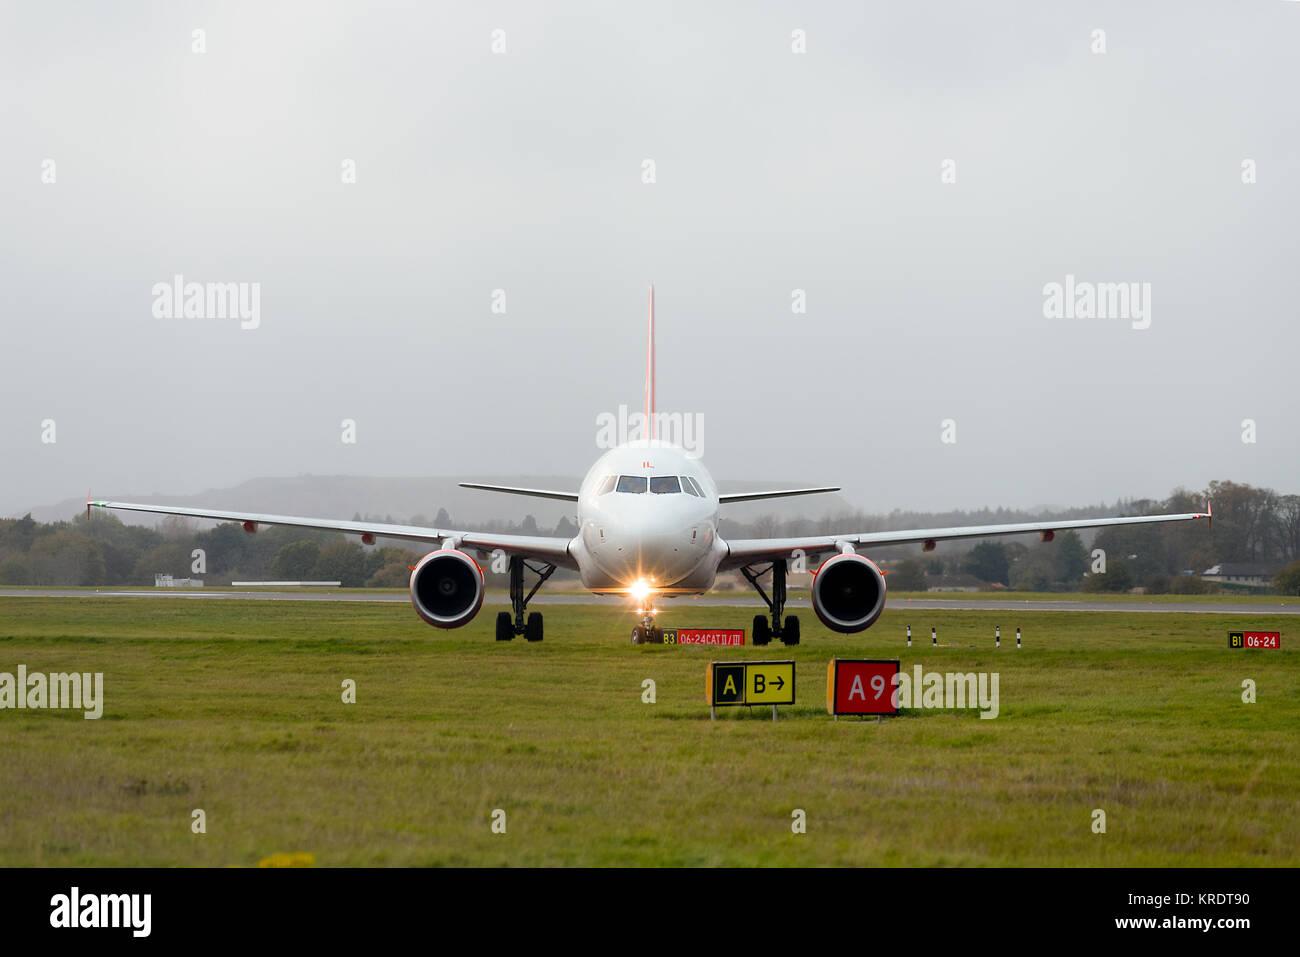 EasyJet passenger airplane G-EZIL Airbus A319-111 taxiing after landing at Edinburgh International Airport. - Stock Image